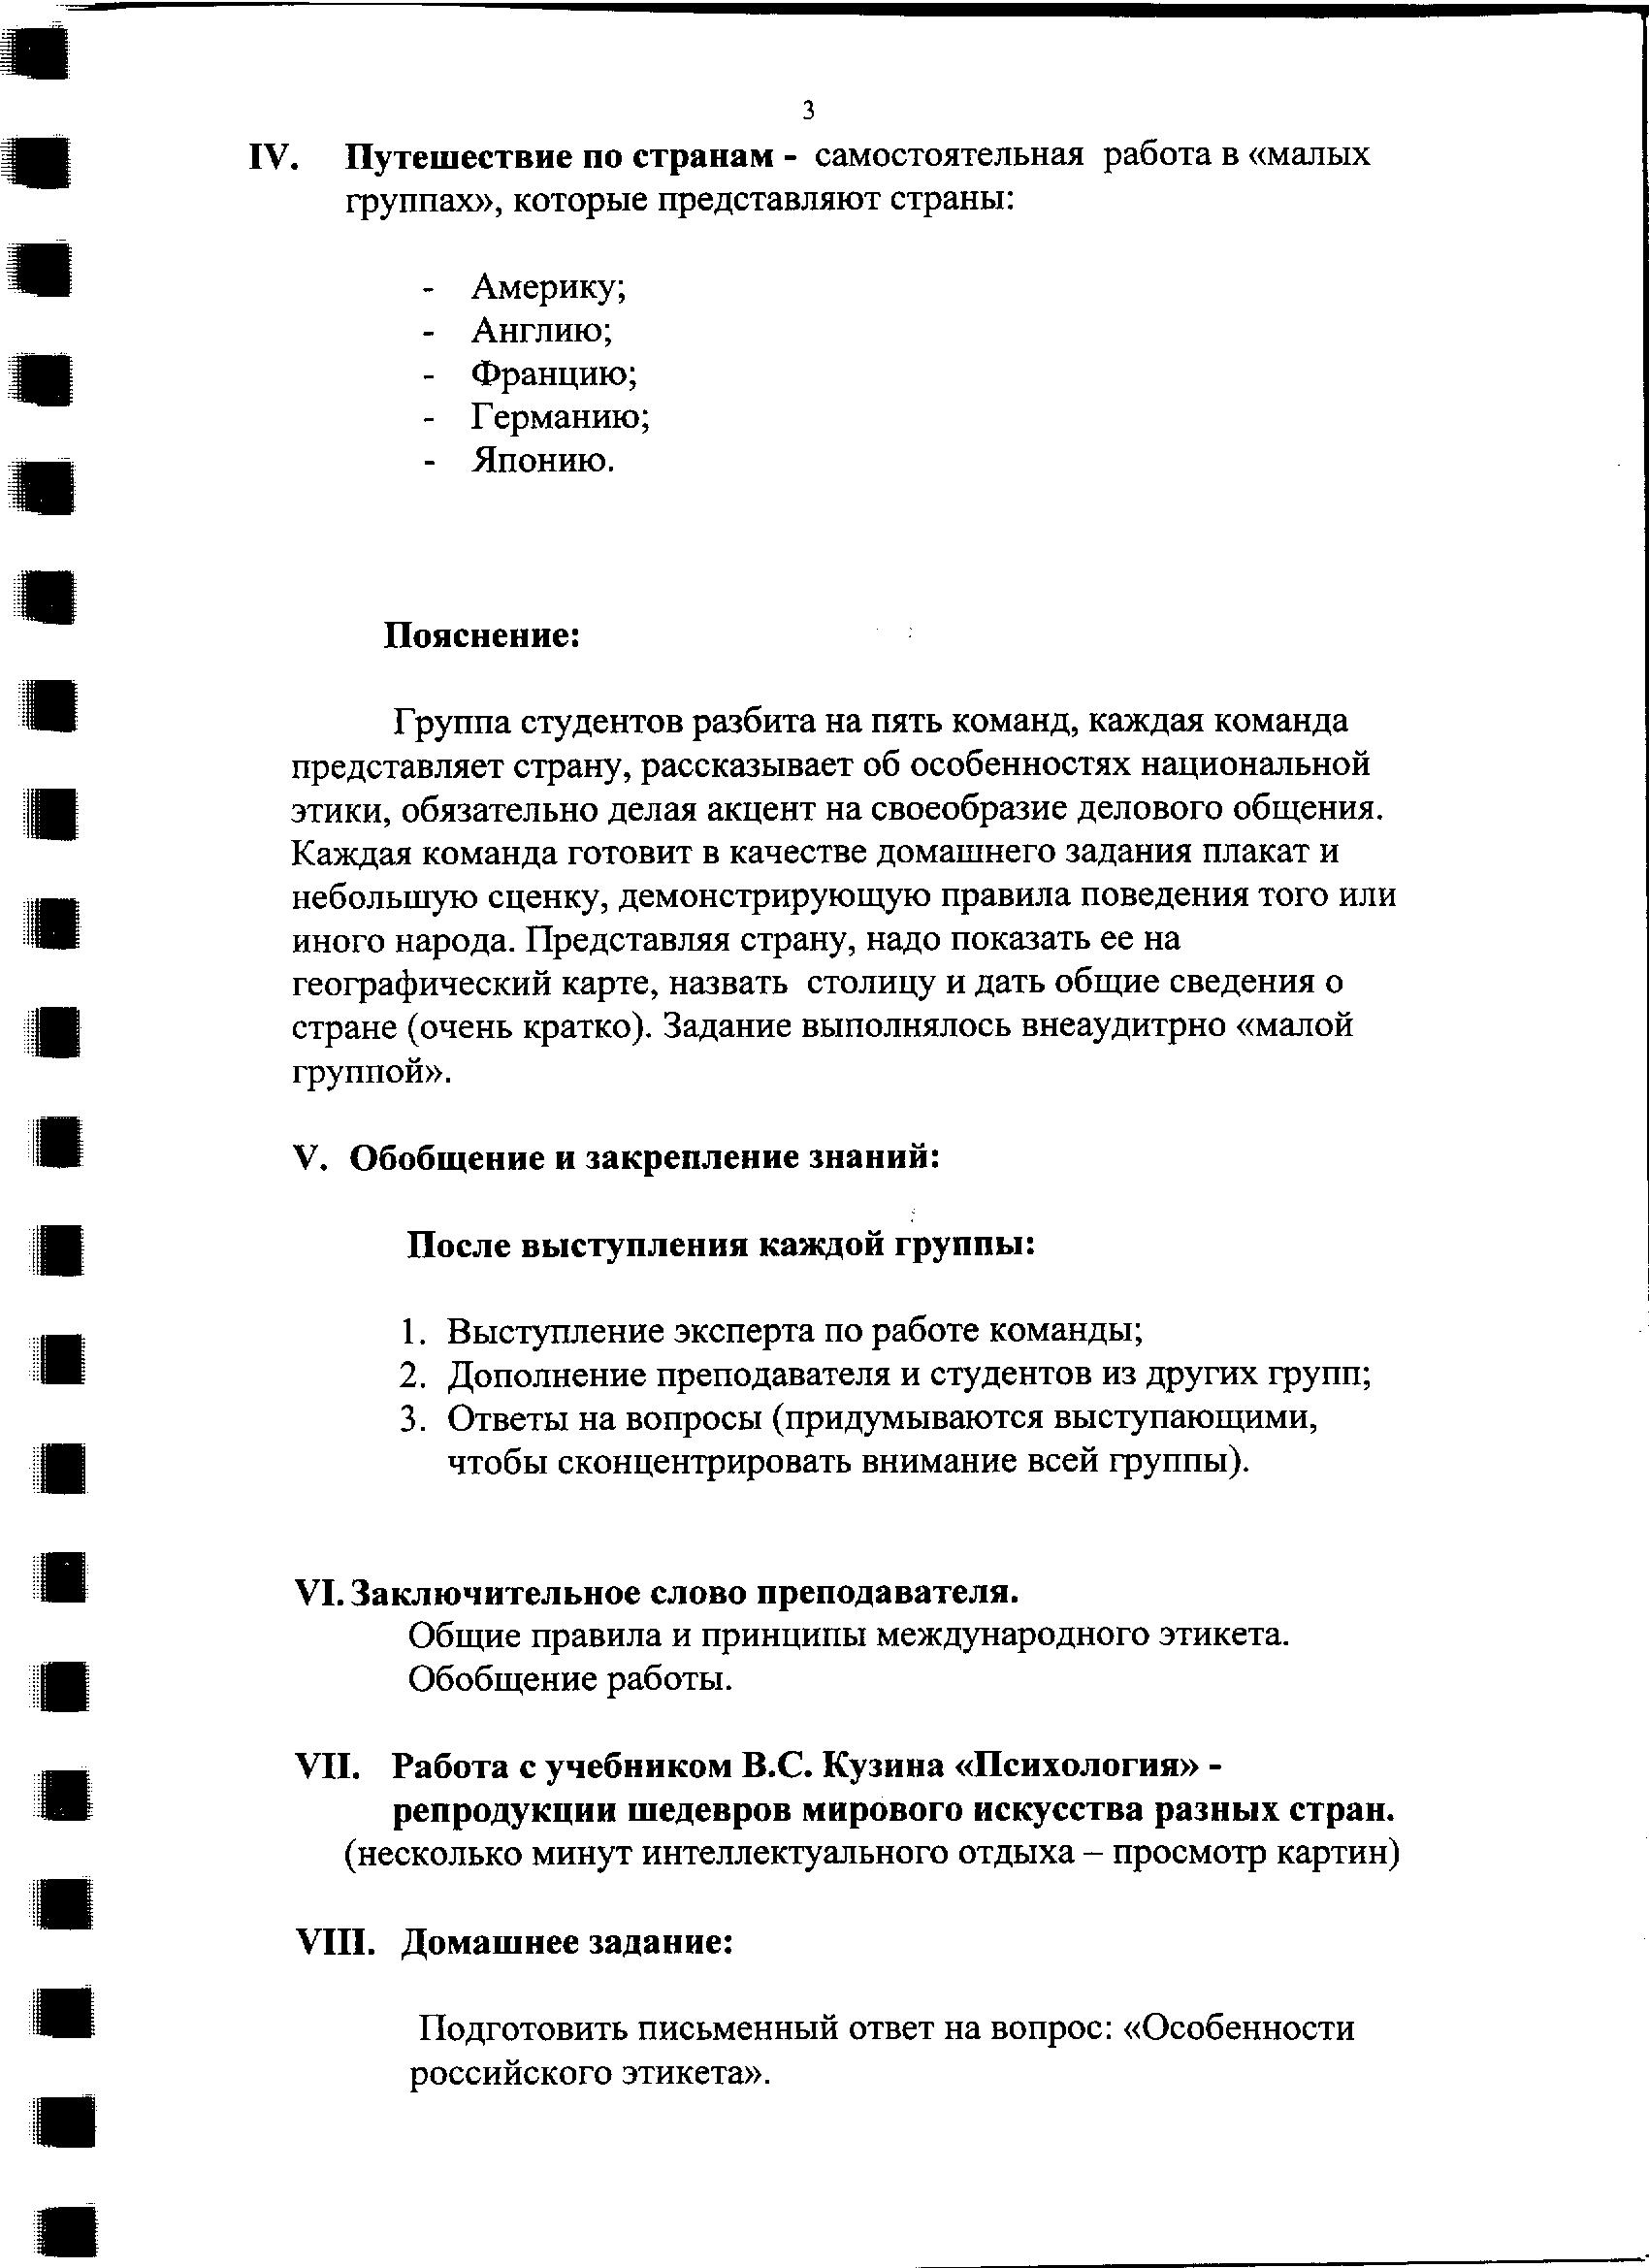 C:\Documents and Settings\Николай\Мои документы\Мои рисунки\Урок путешествие4.bmp